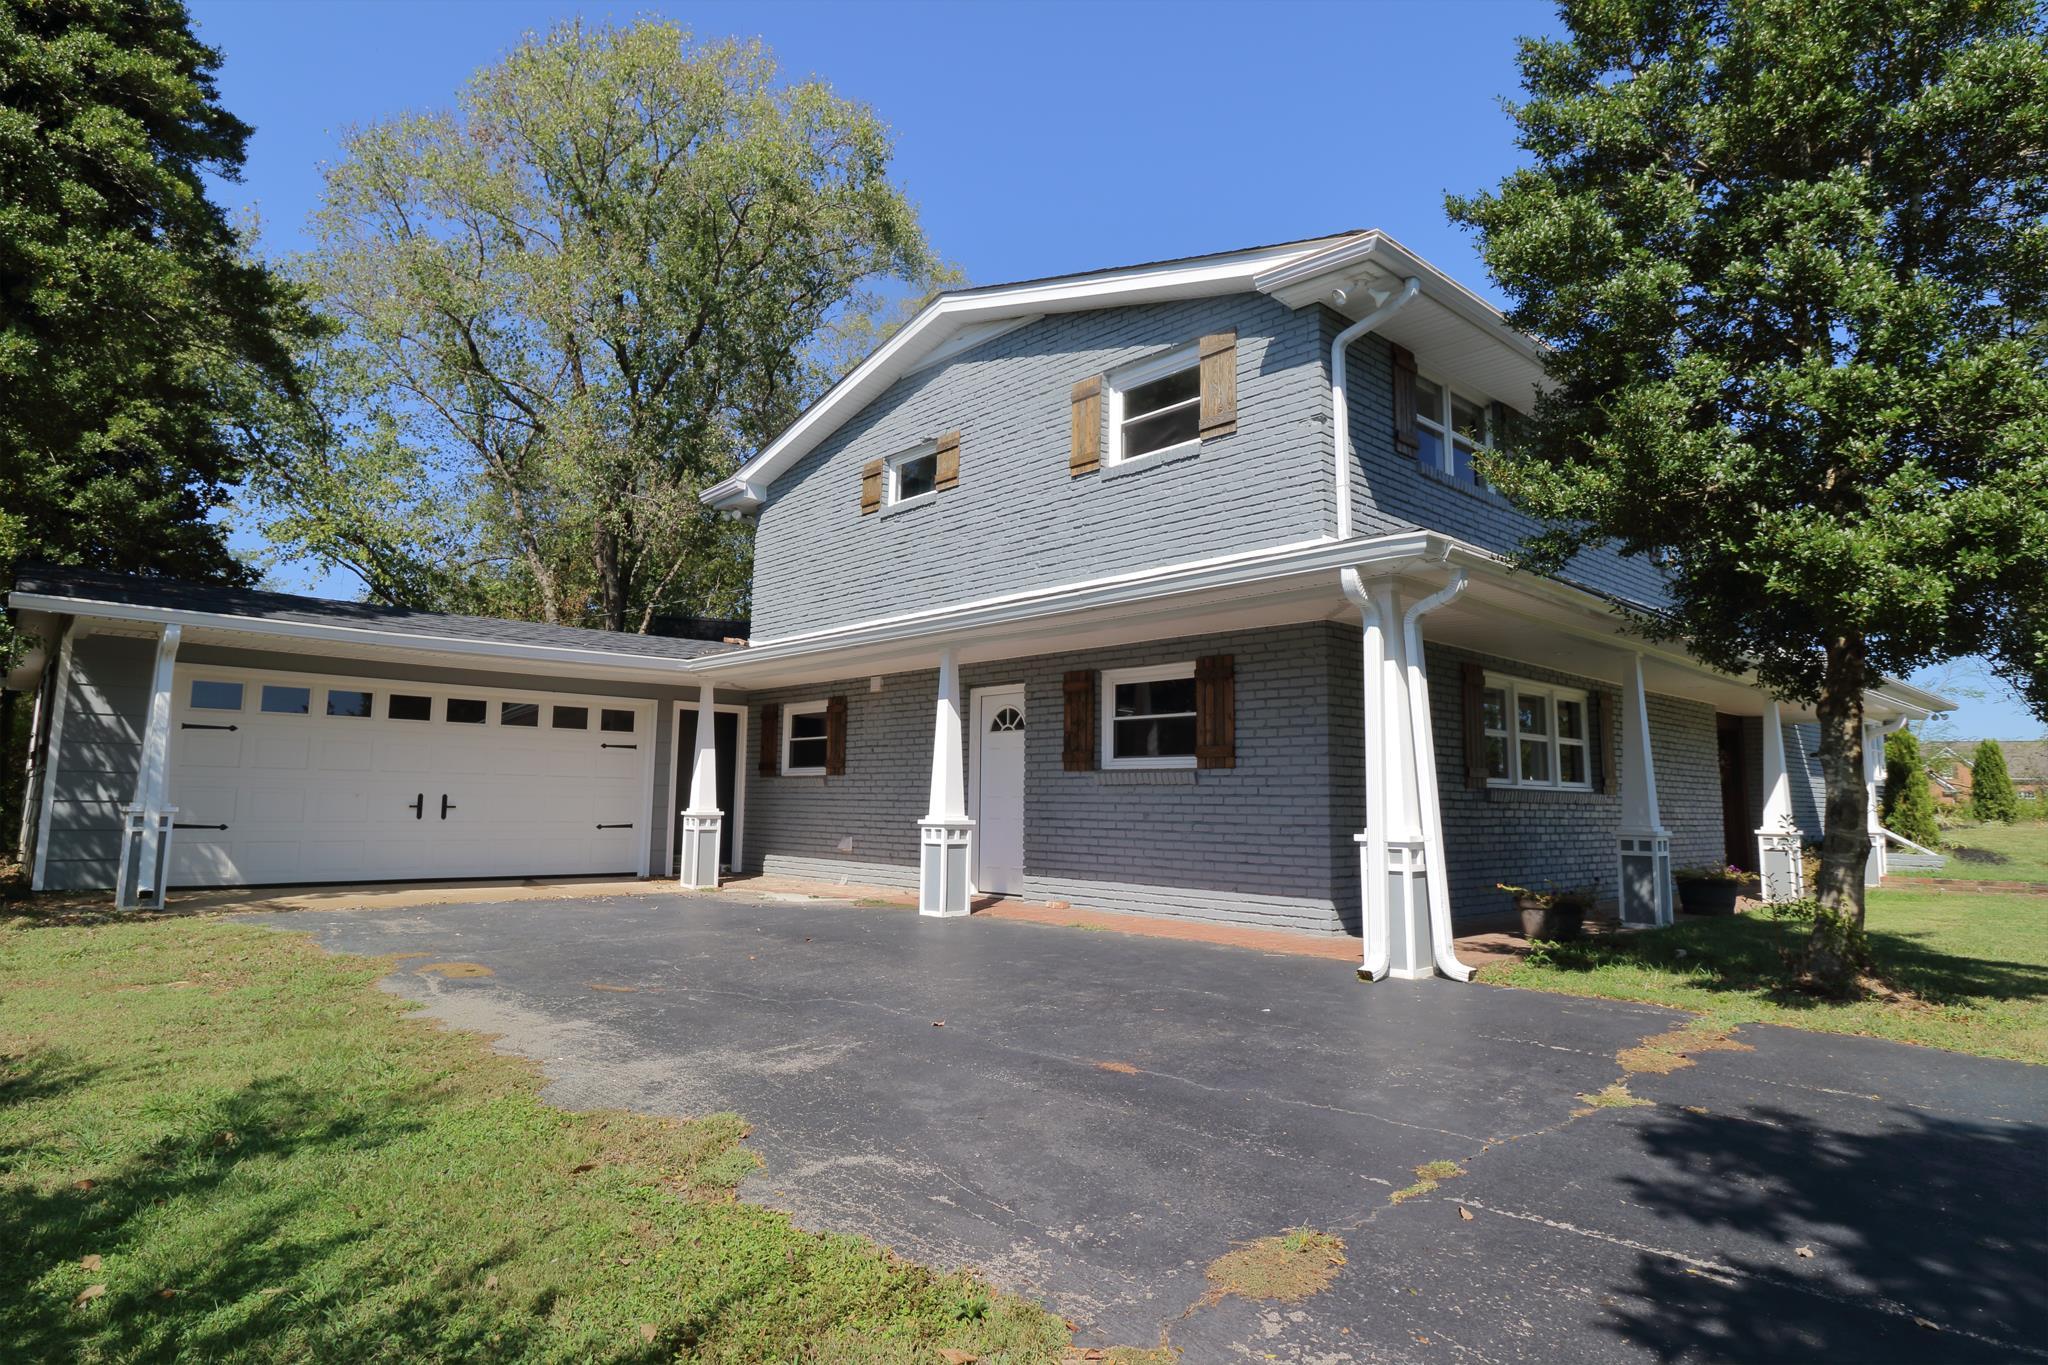 126 Indian Hills Dr, Clarksville, TN 37043 - Clarksville, TN real estate listing